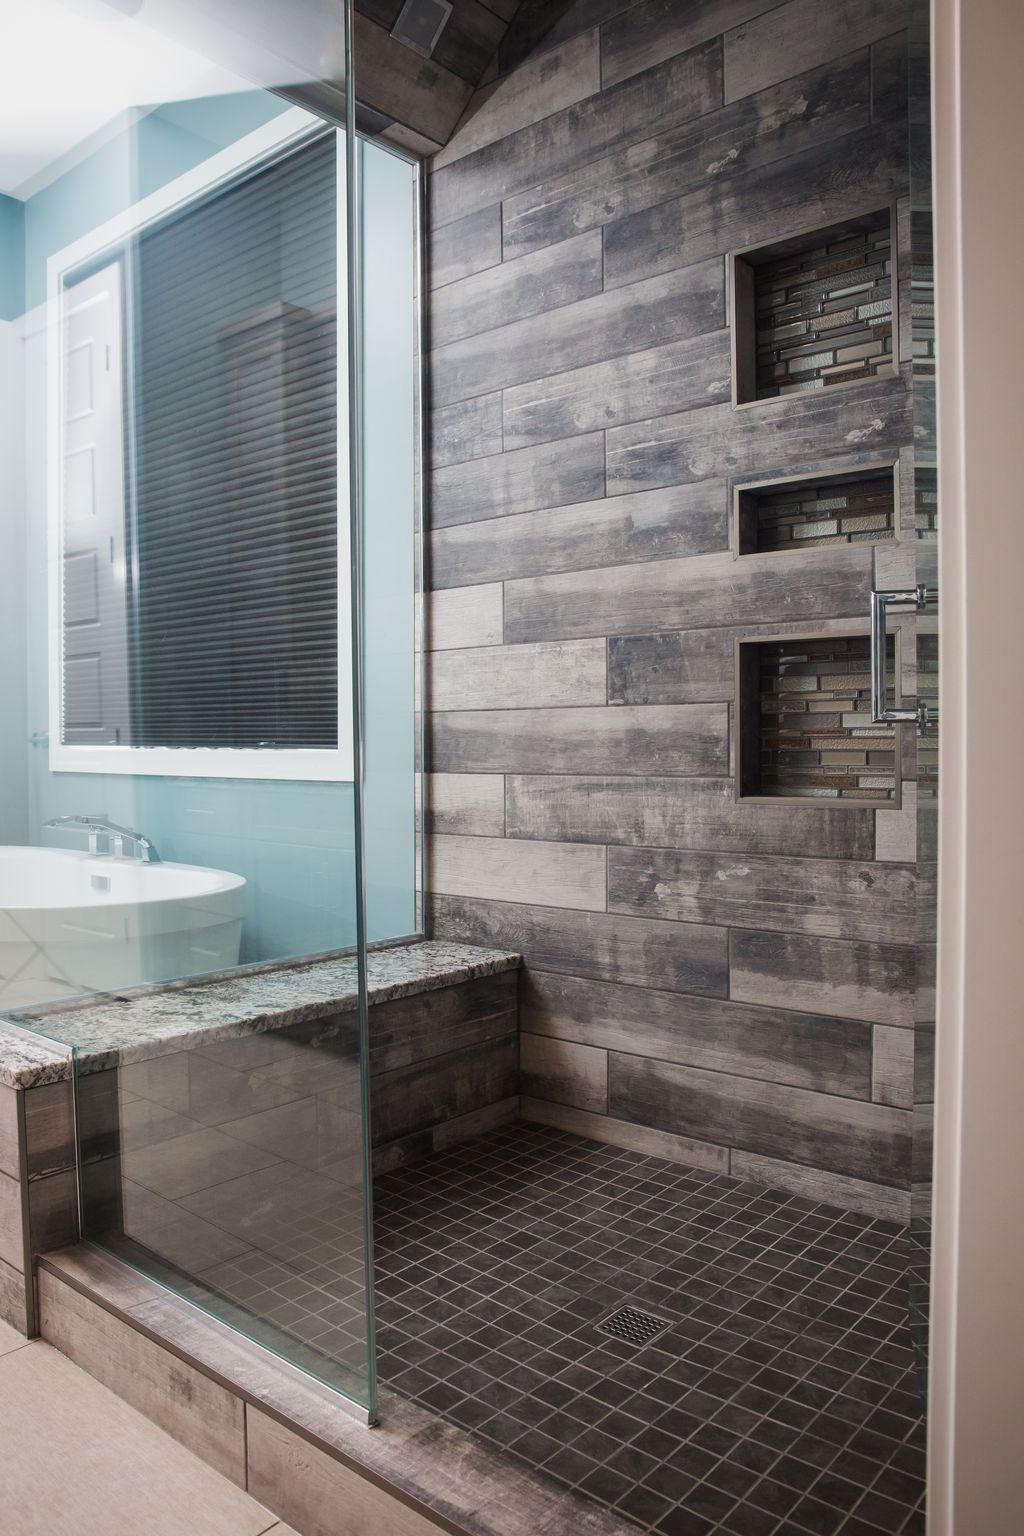 13 Big Ideas For Tiny Bathrooms Farmhouse Shower Bathroom Tile Designs Bathroom Remodel Shower